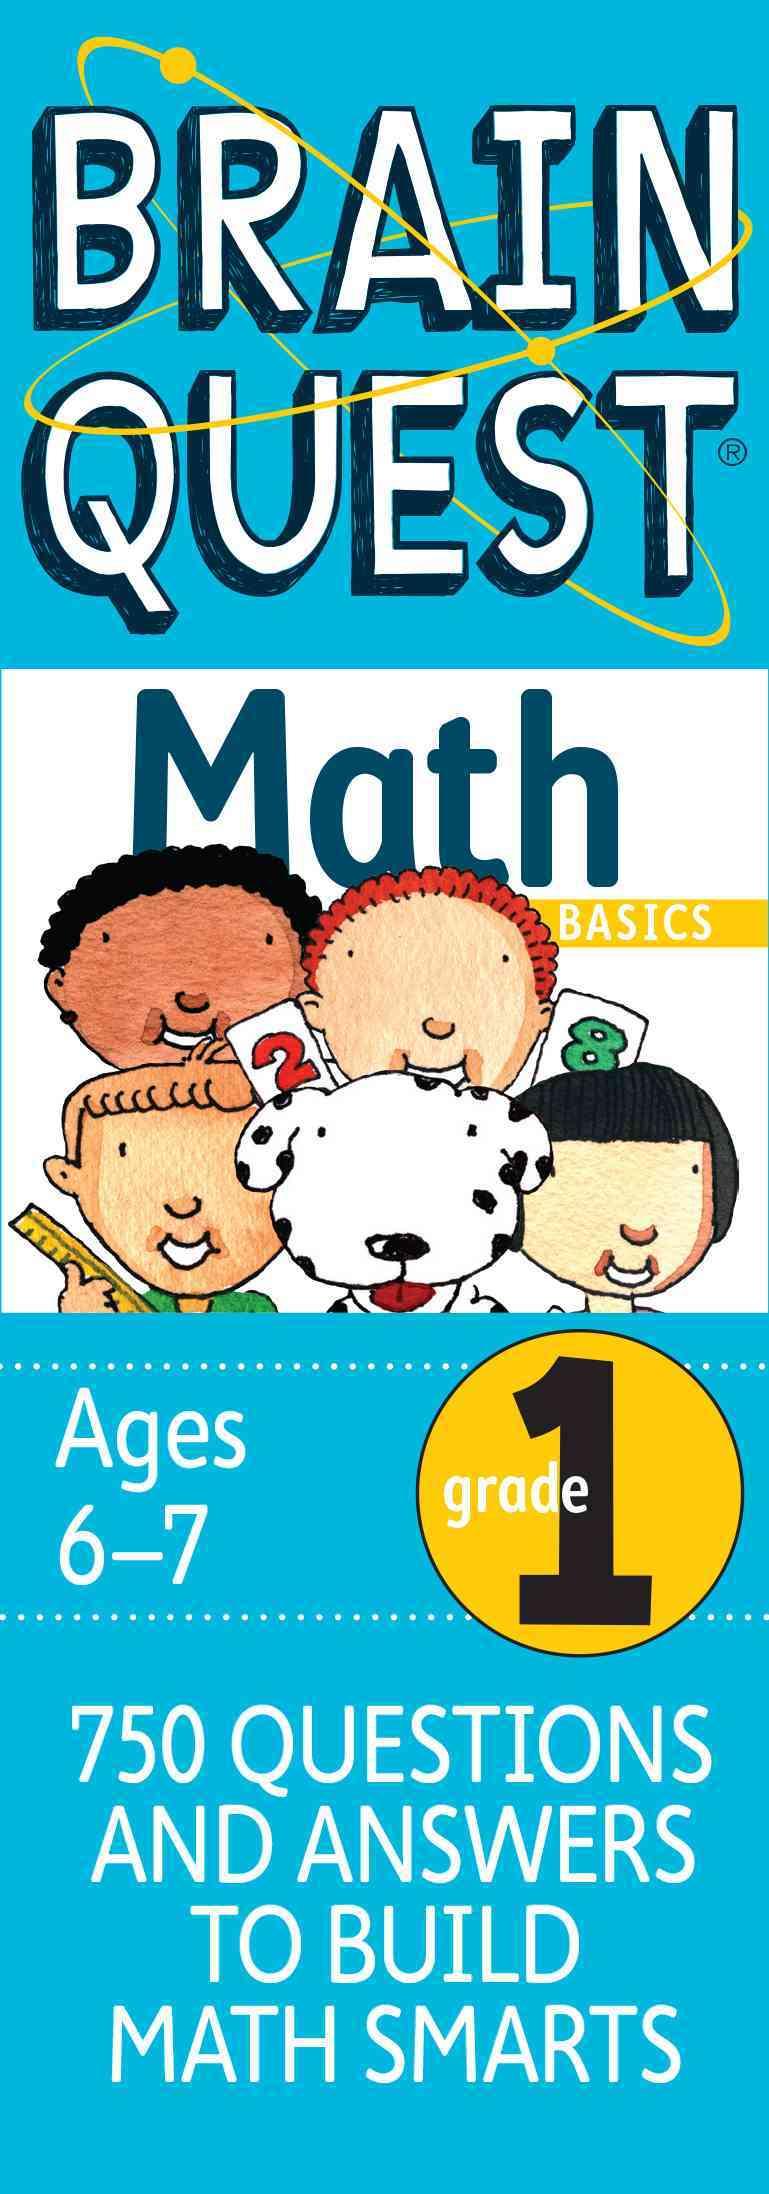 Brain Quest  Math Basics Grade 1 By Martinelli, Marjorie